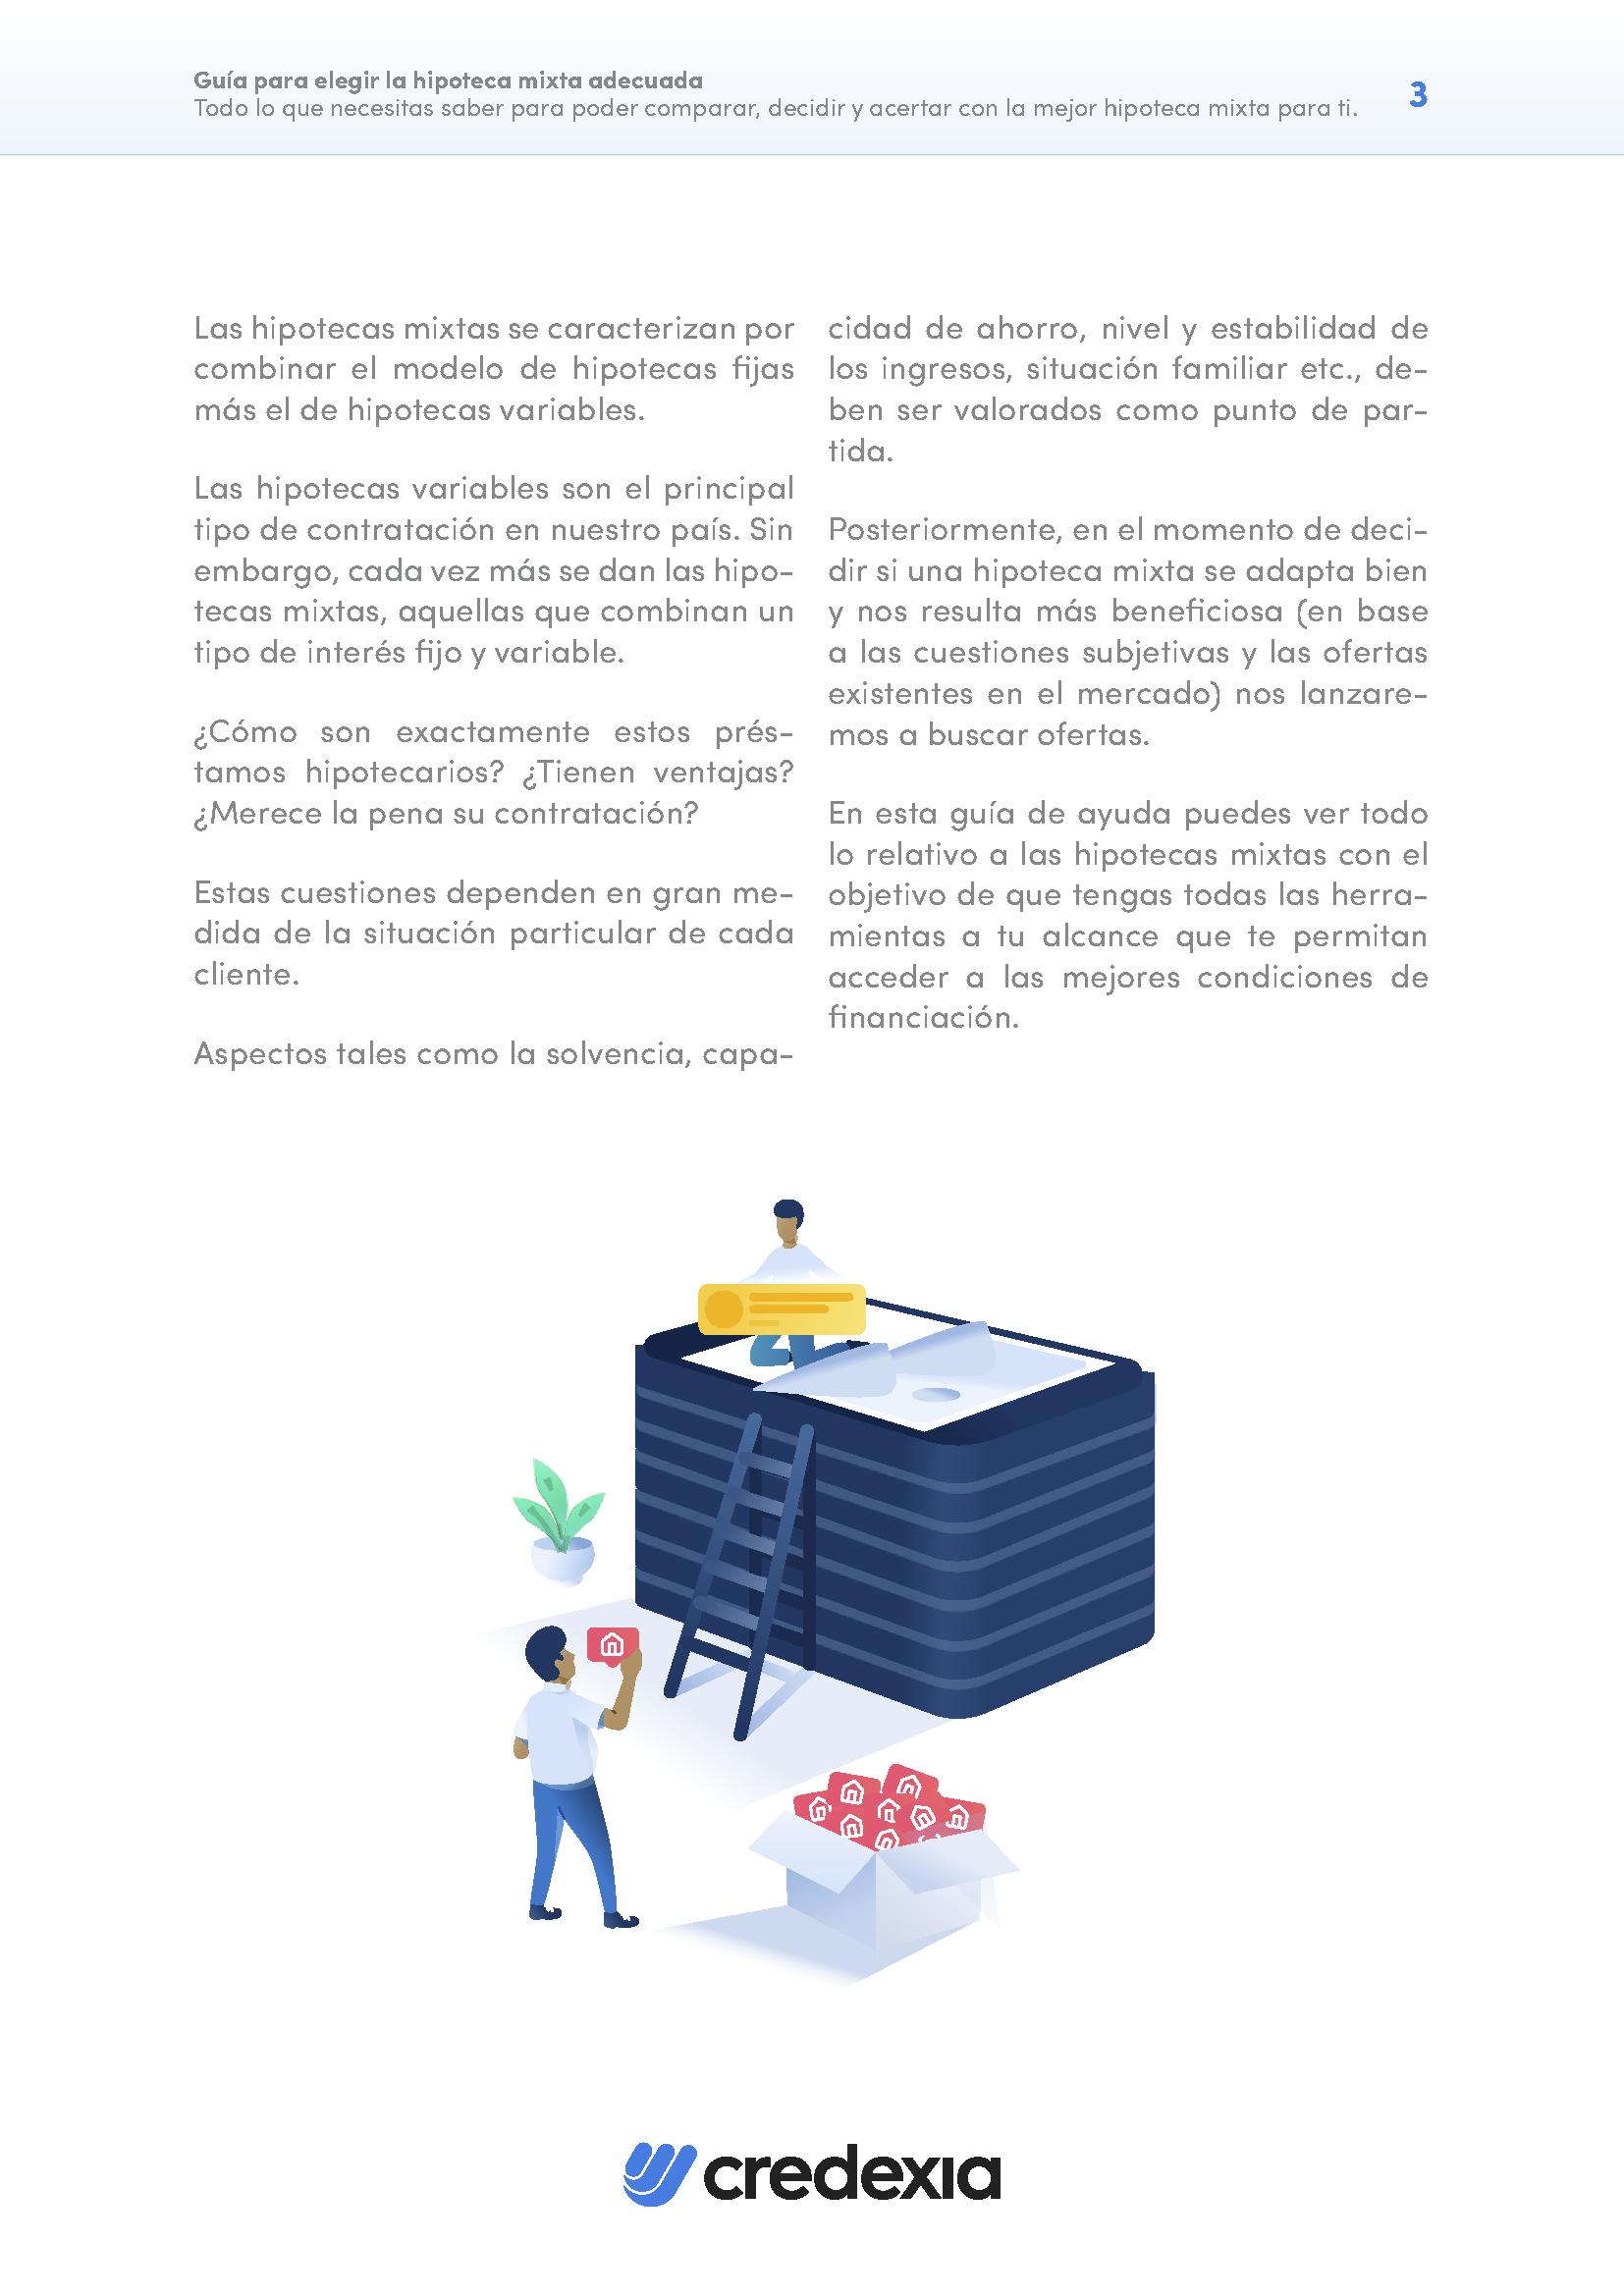 CRE - Hipotecas mixtas - Portada 2D_Página_03